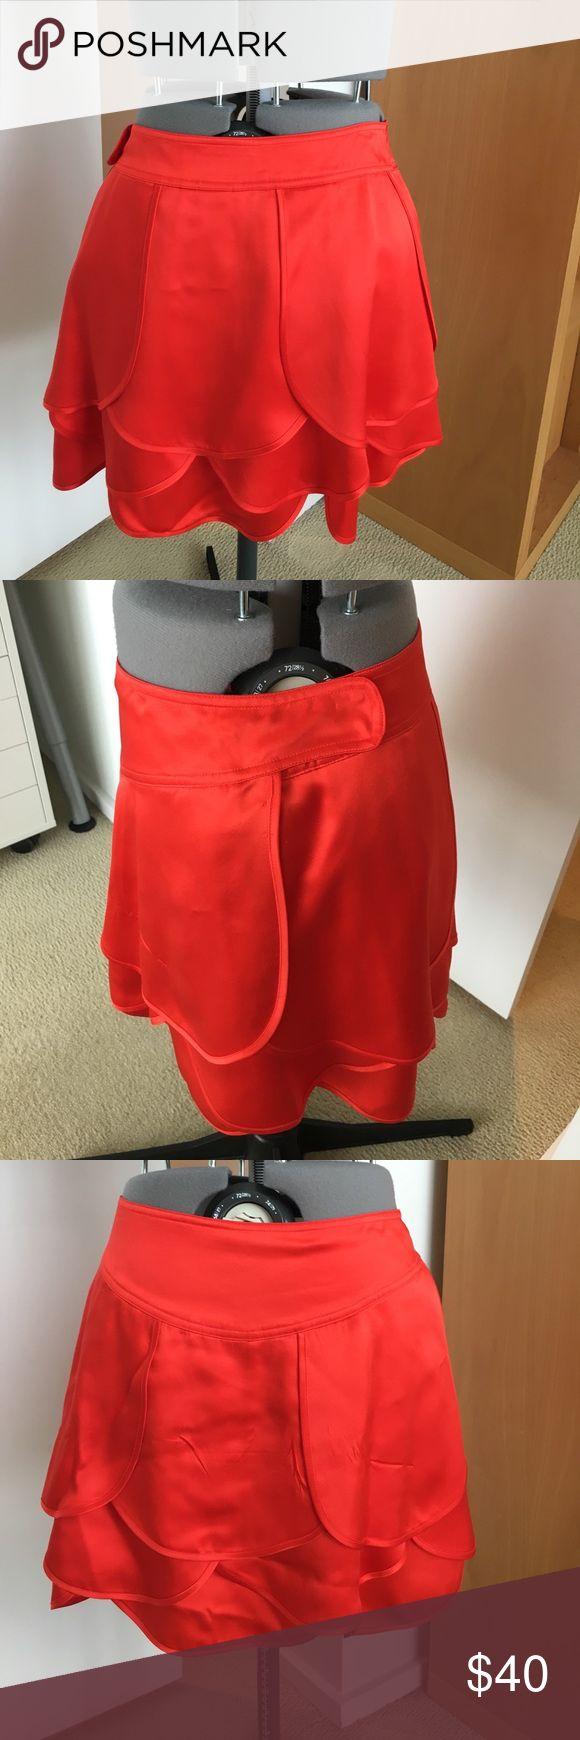 A/X Armani Exchange Red silk mini skirt A/X Armani Exchange Red 100% silk mini skirt, size 6 A/X Armani Exchange Skirts Mini